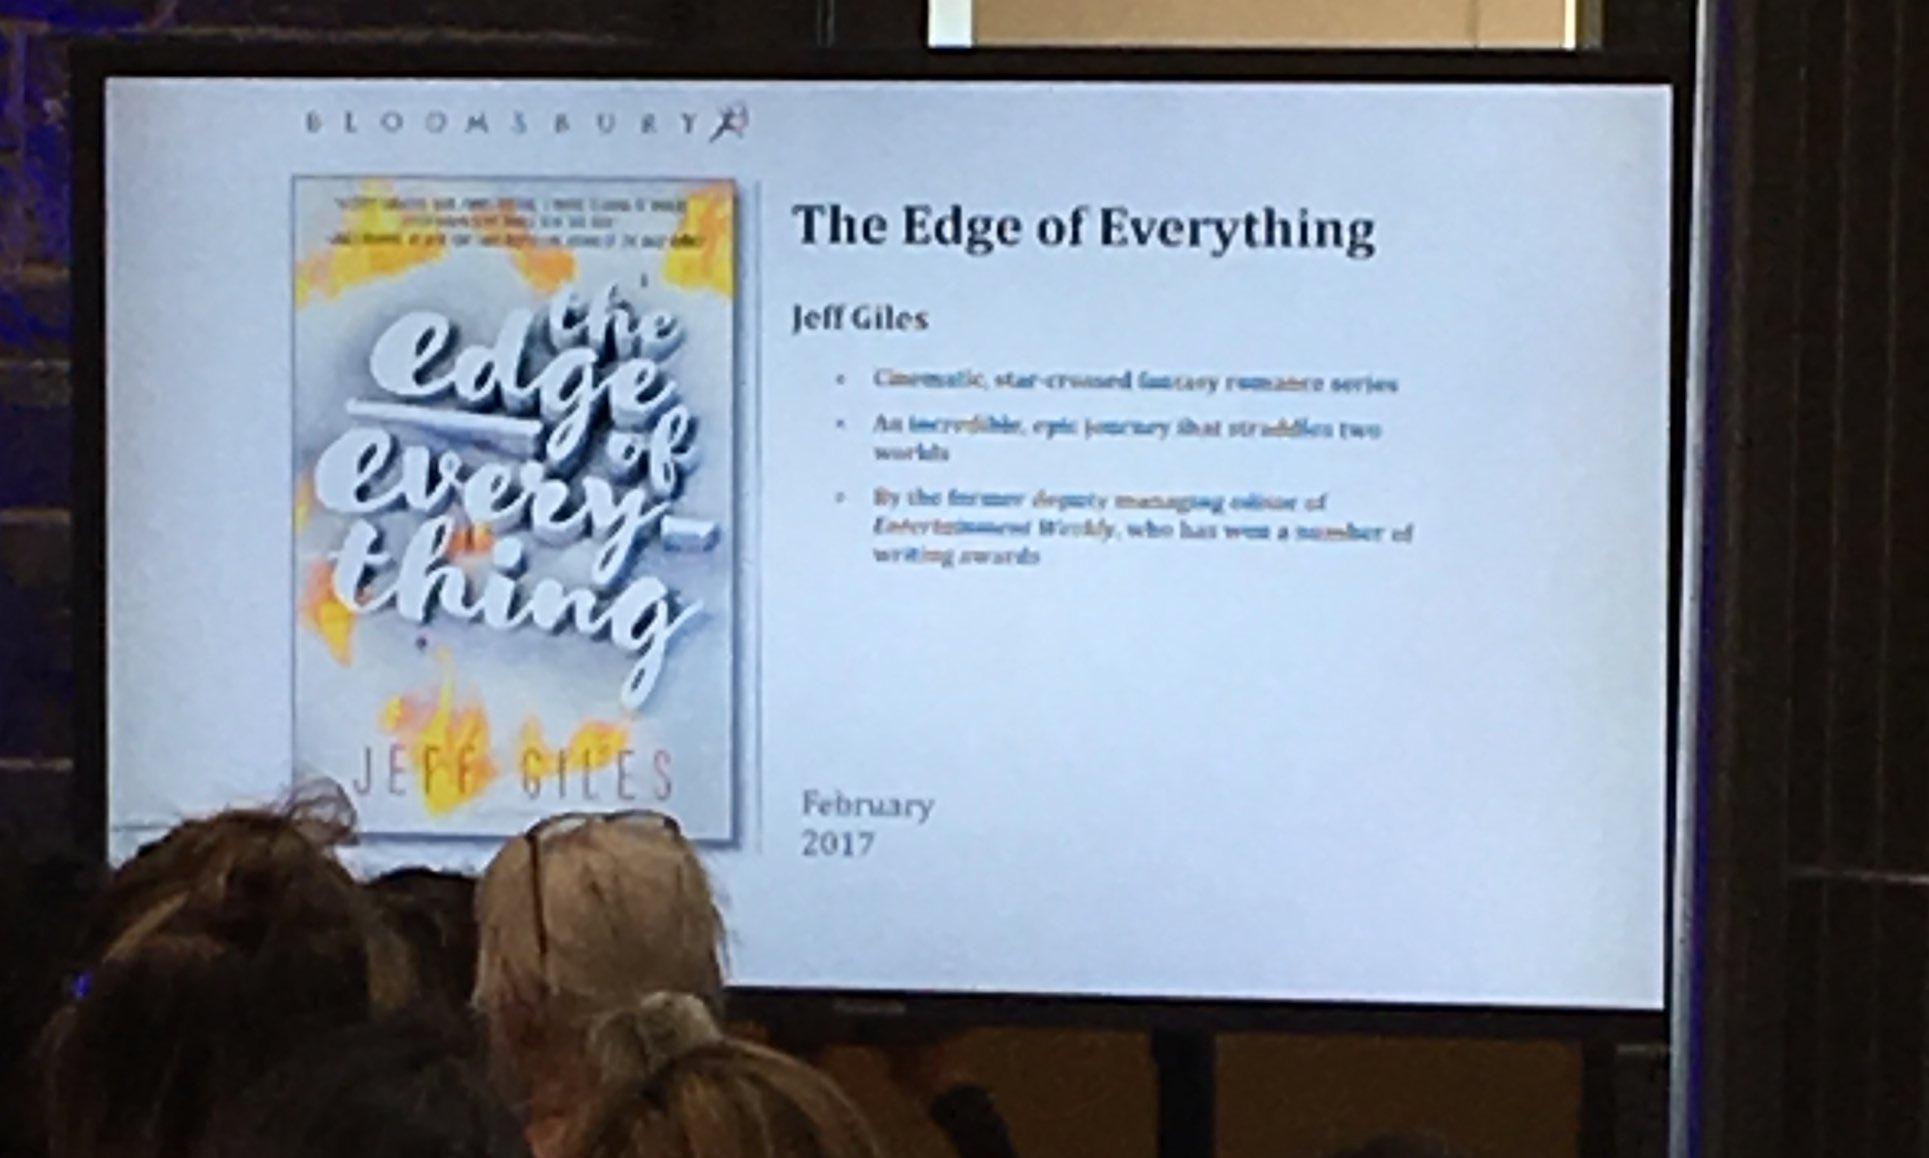 Next: February, The Edge of Everything by Jeff Giles, YA Fantasy series. @BloomsburySyd #YAshowcase https://t.co/VqFVddrhiJ